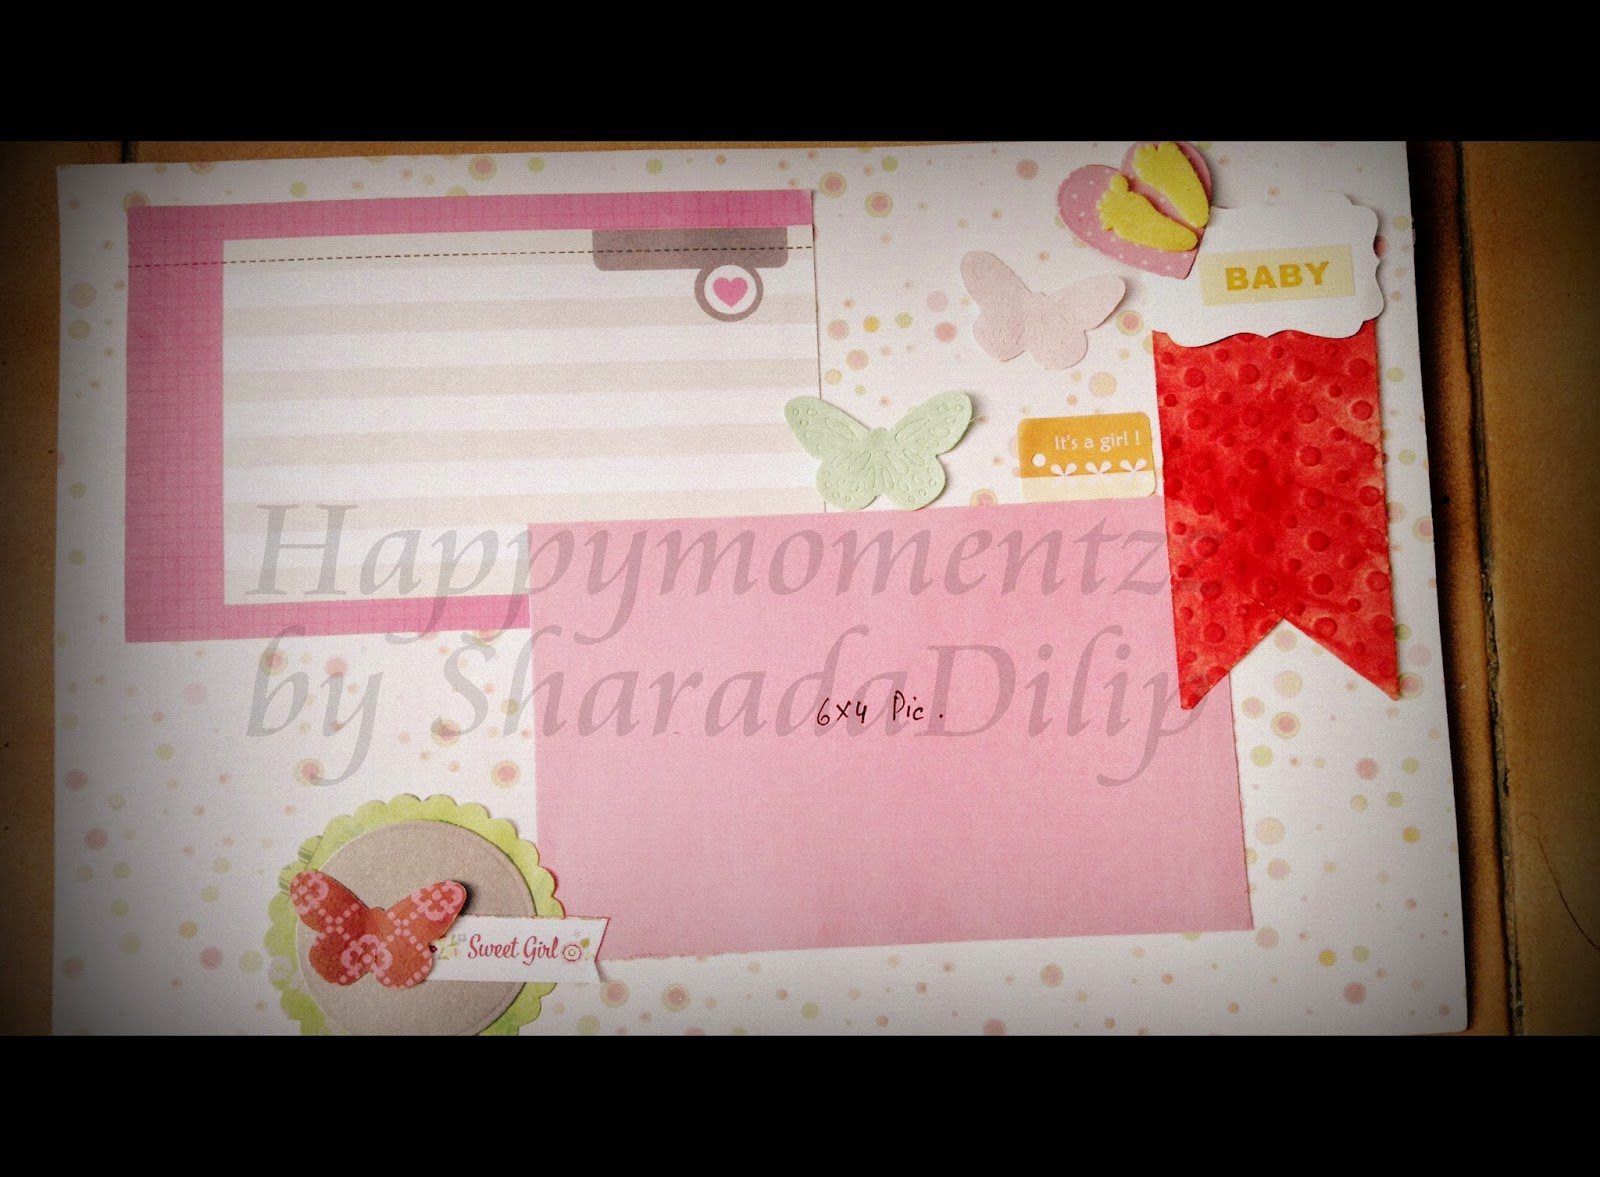 Happymomentzz Crafting By Sharada Dilip Baby Girl Album